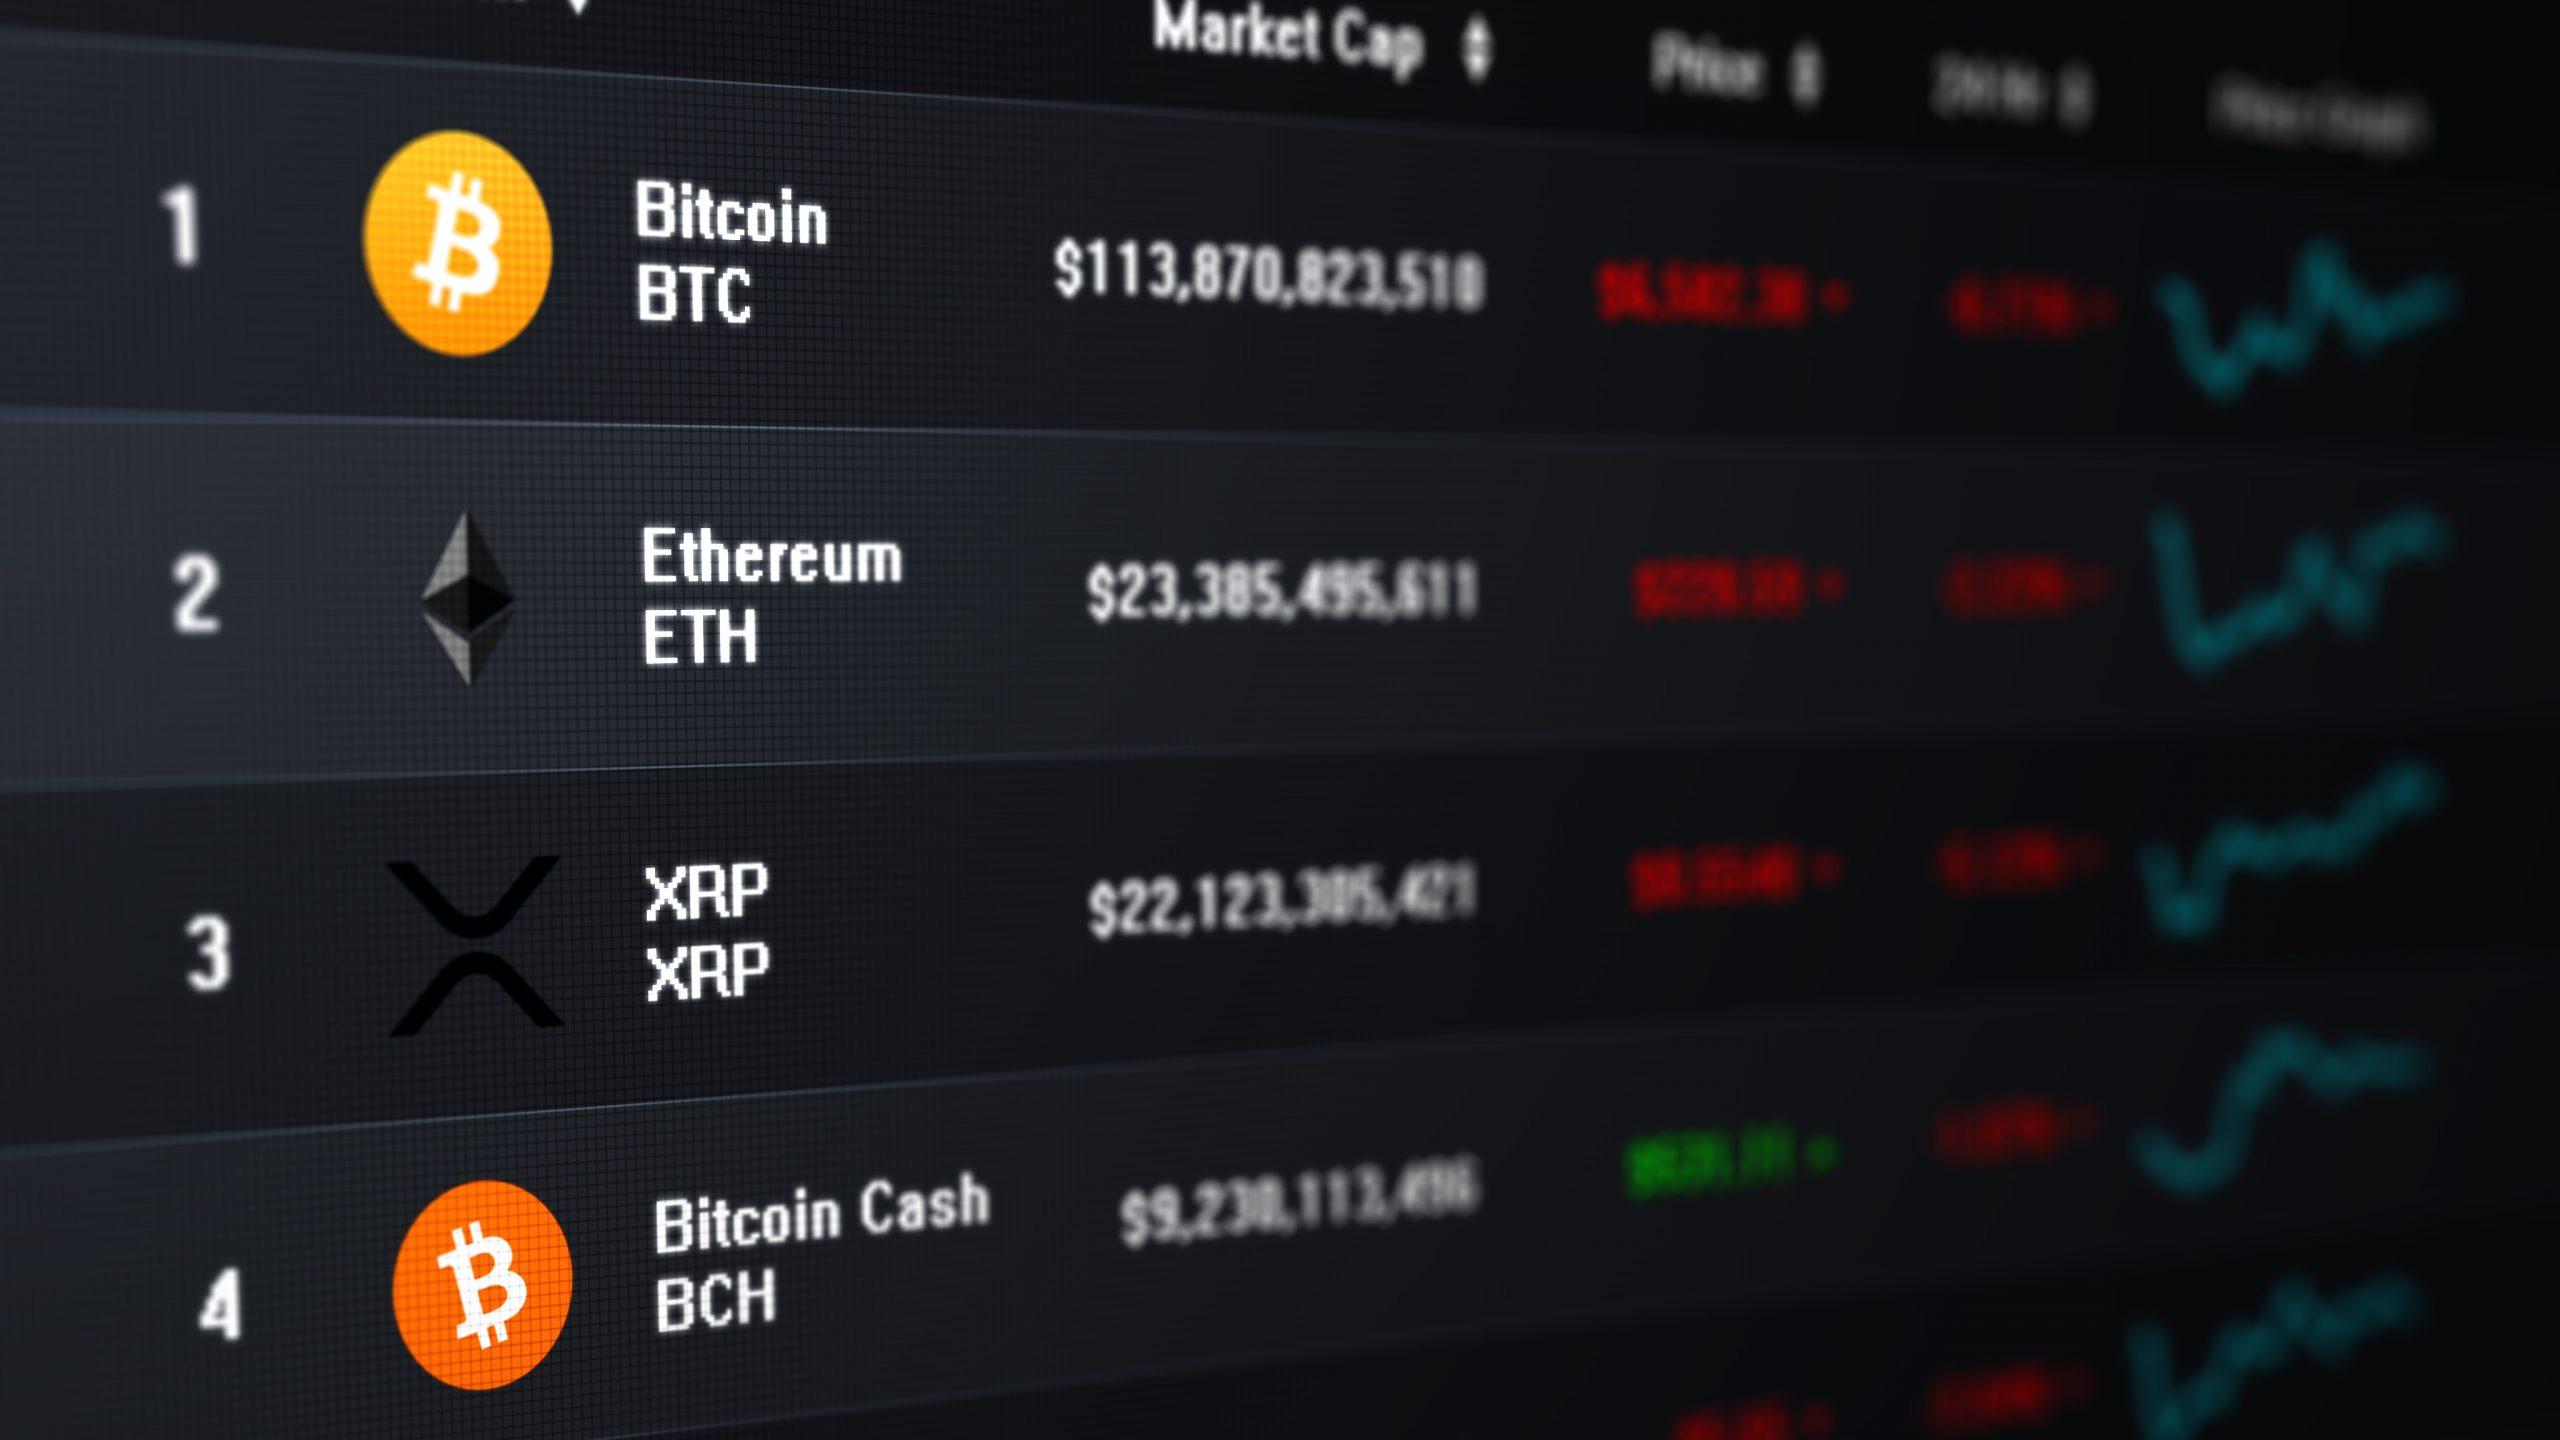 Bitcoin market capitalization: exceeded $ 1 trillion